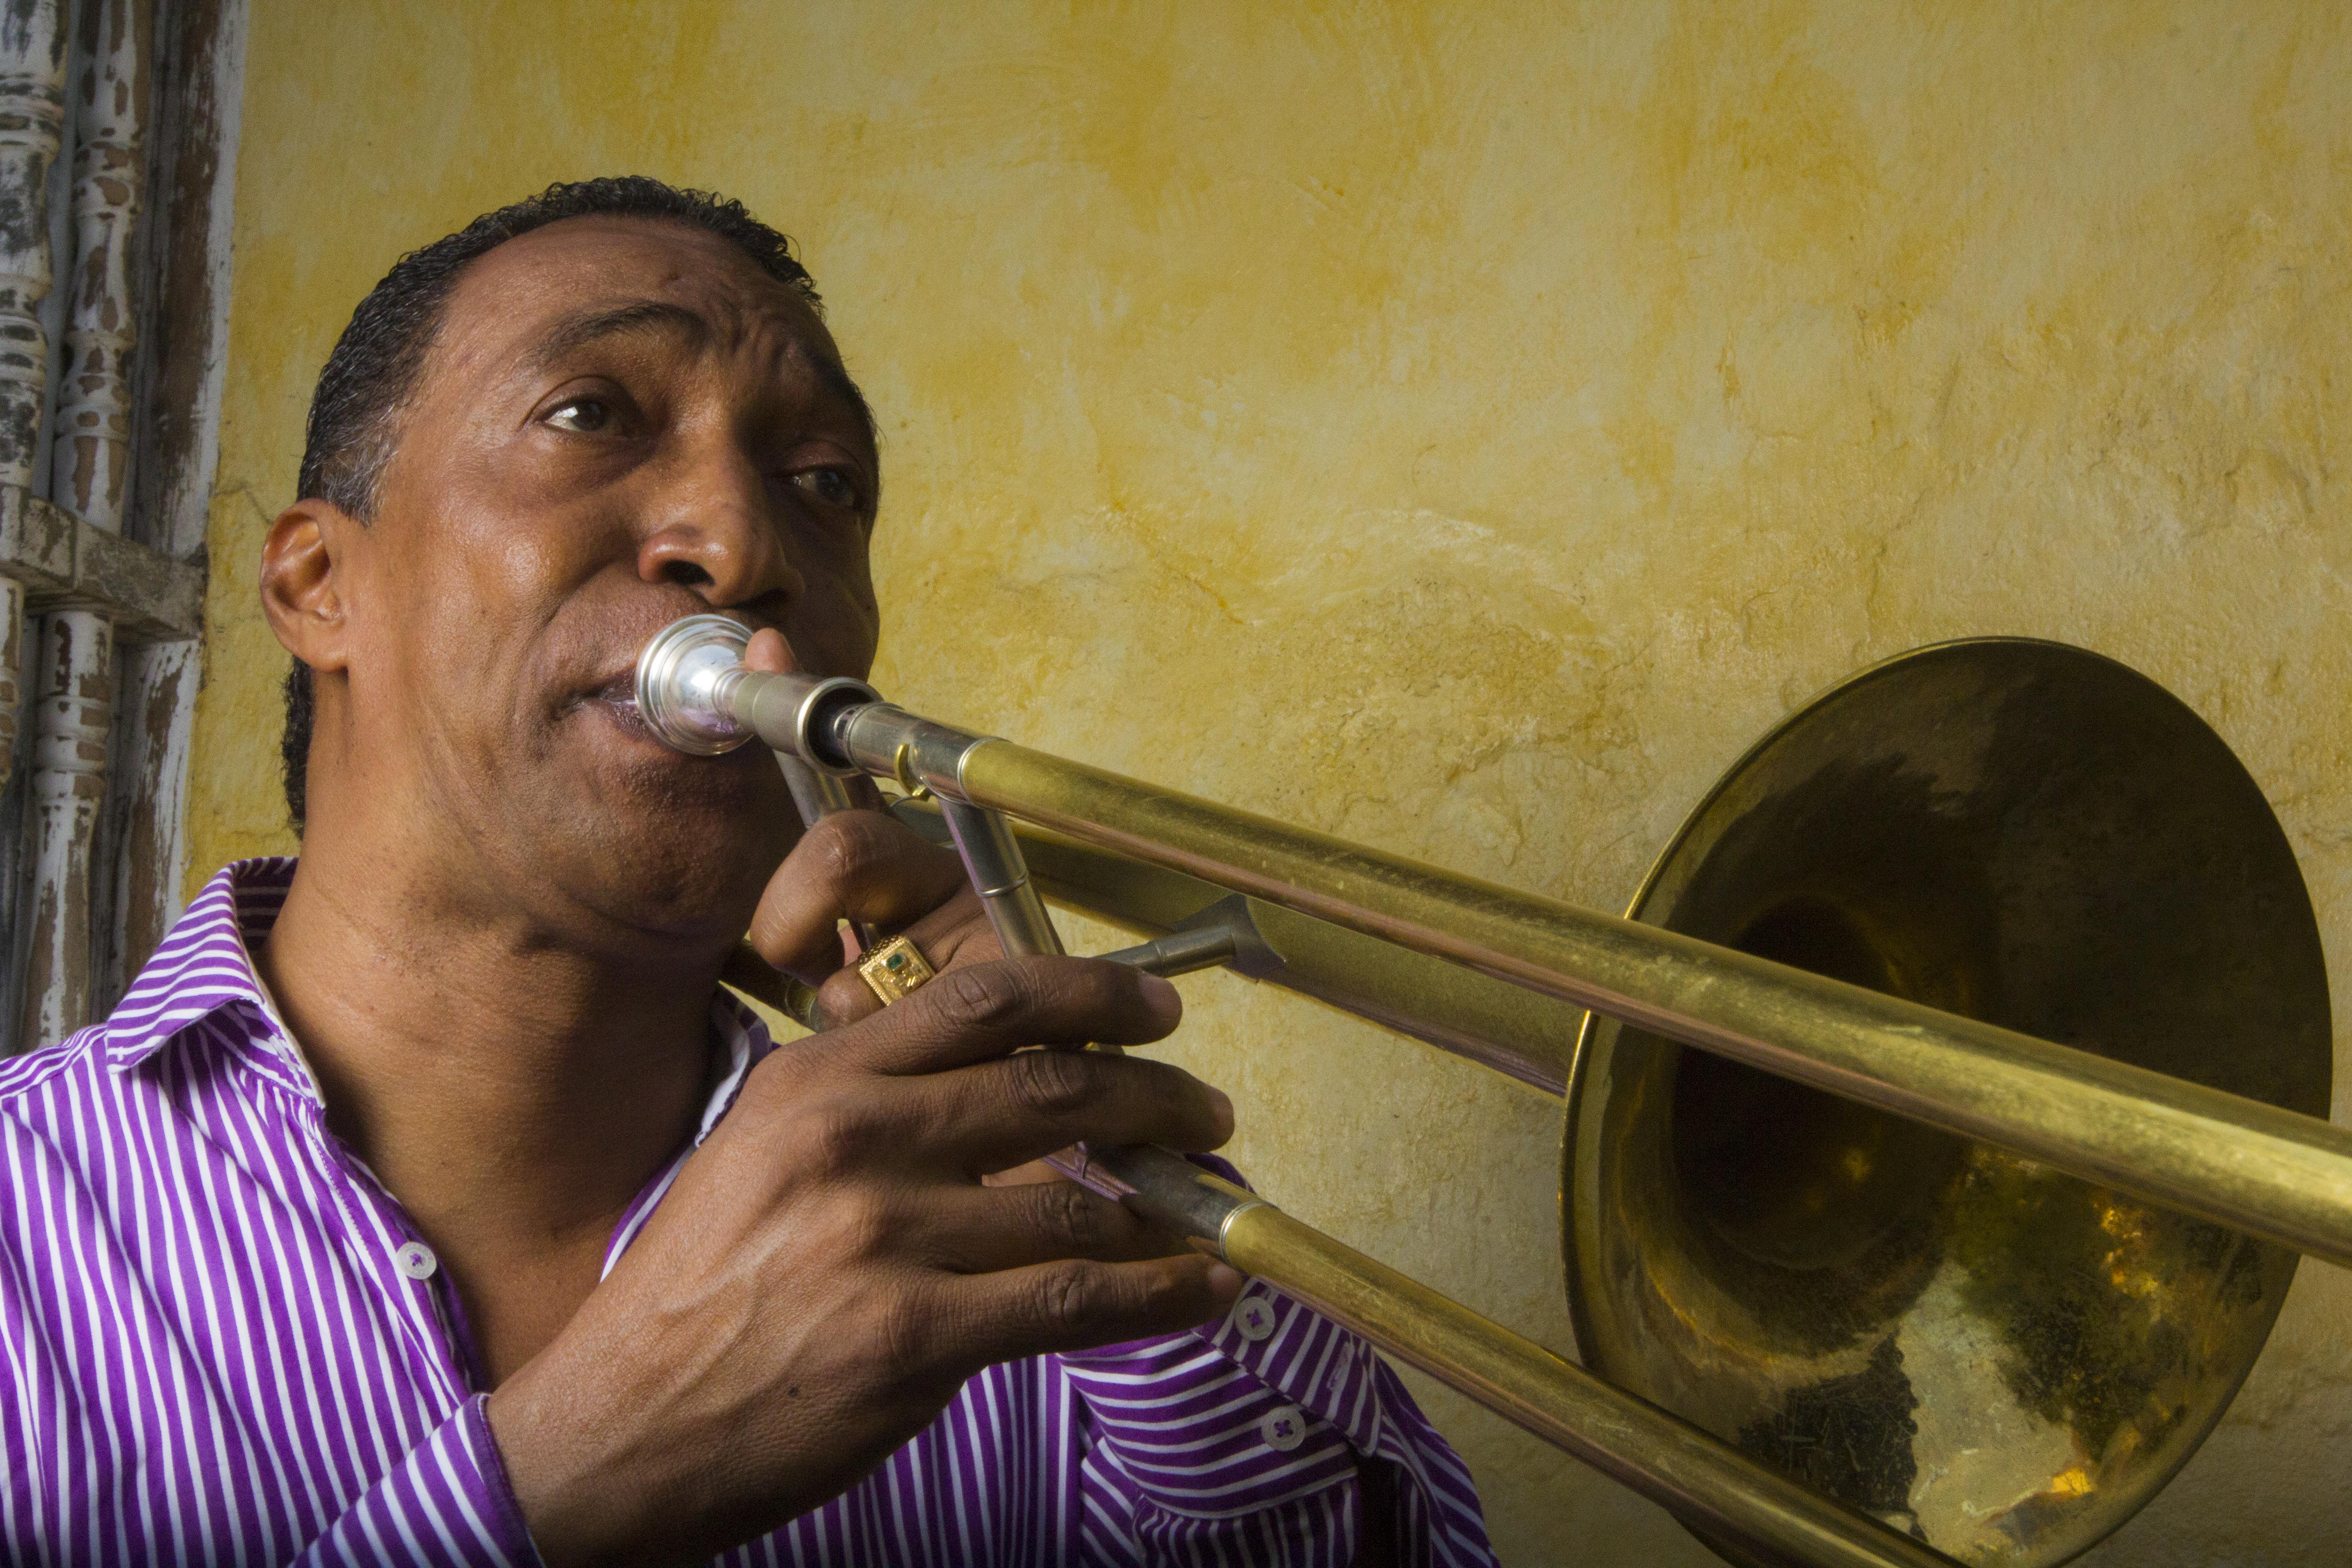 Salsa 220, Orquesta de Salsa, Orquesta en Cartagena, Orquesta cartagena, Oscar Urueta, Orquesta Salsa 220